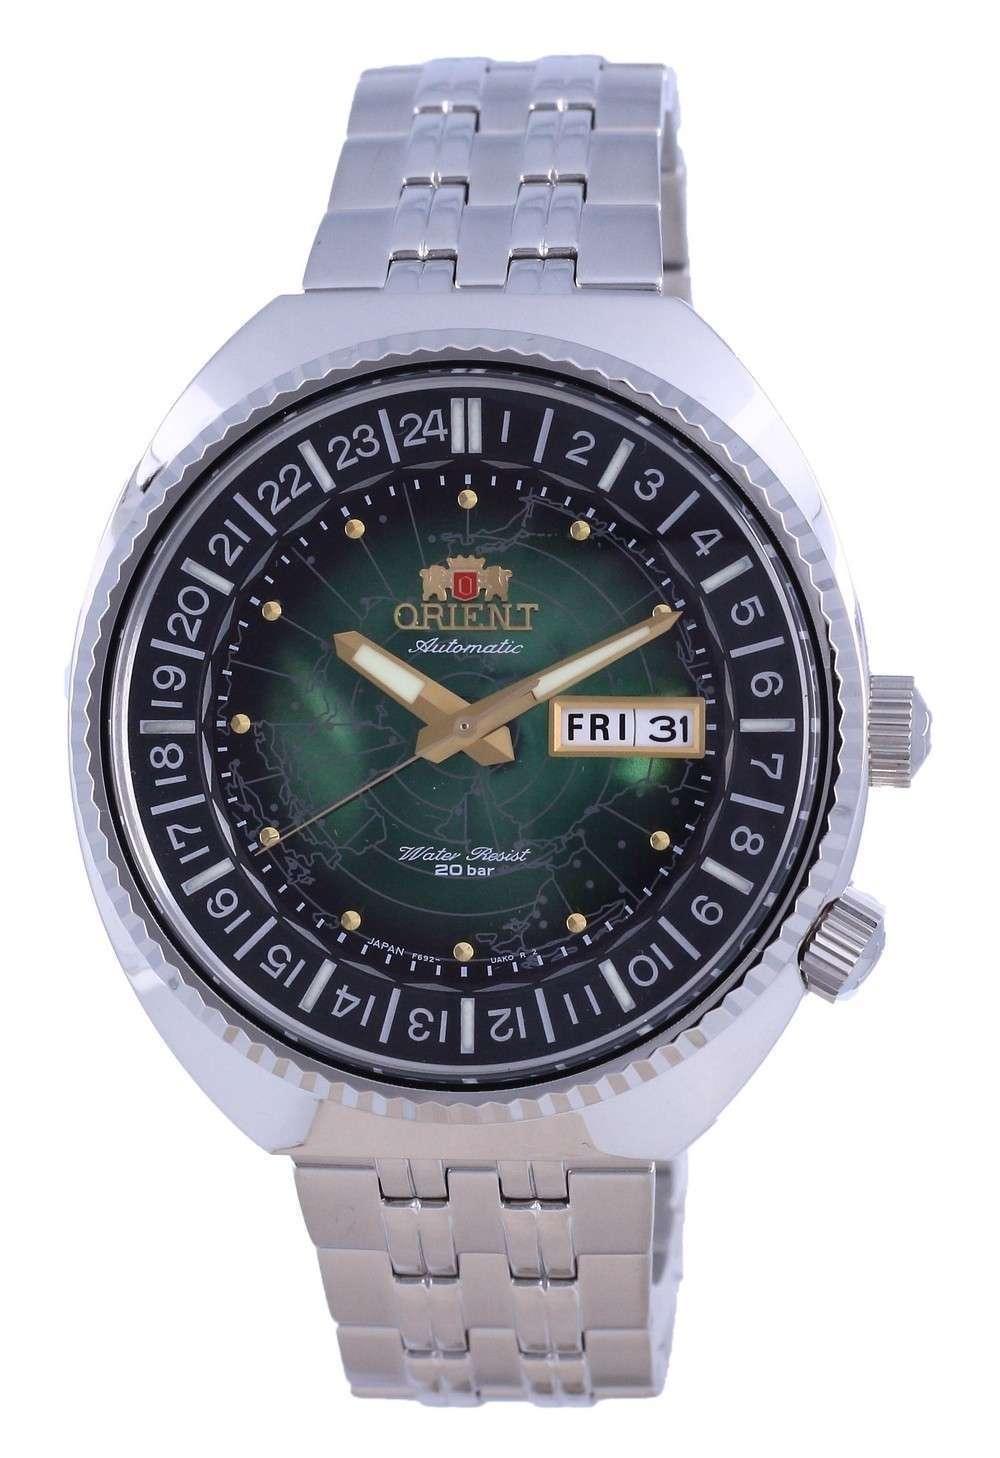 Reloj para hombre Orient World Map Revival Diver&#39,s Automatic RA-AA0E02E09C 200M